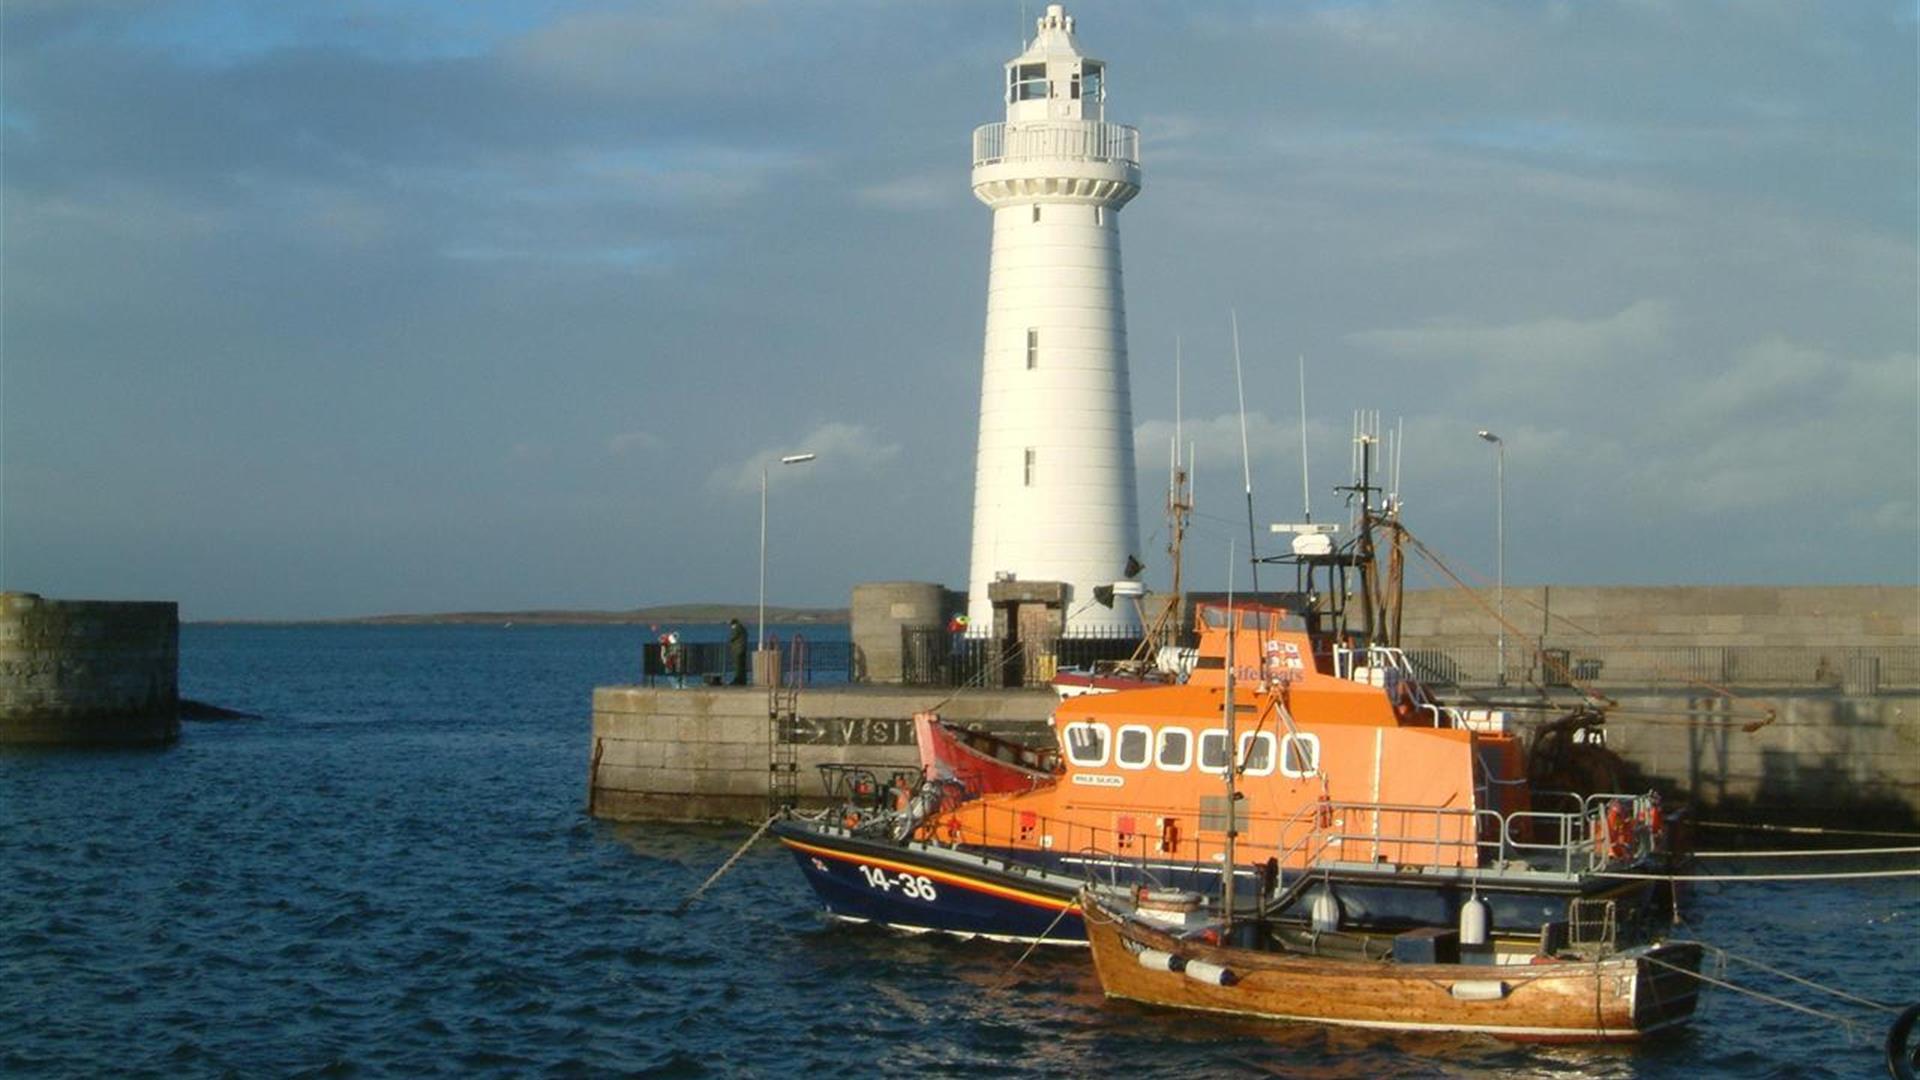 Donaghadee - Harbour & Lighthouse